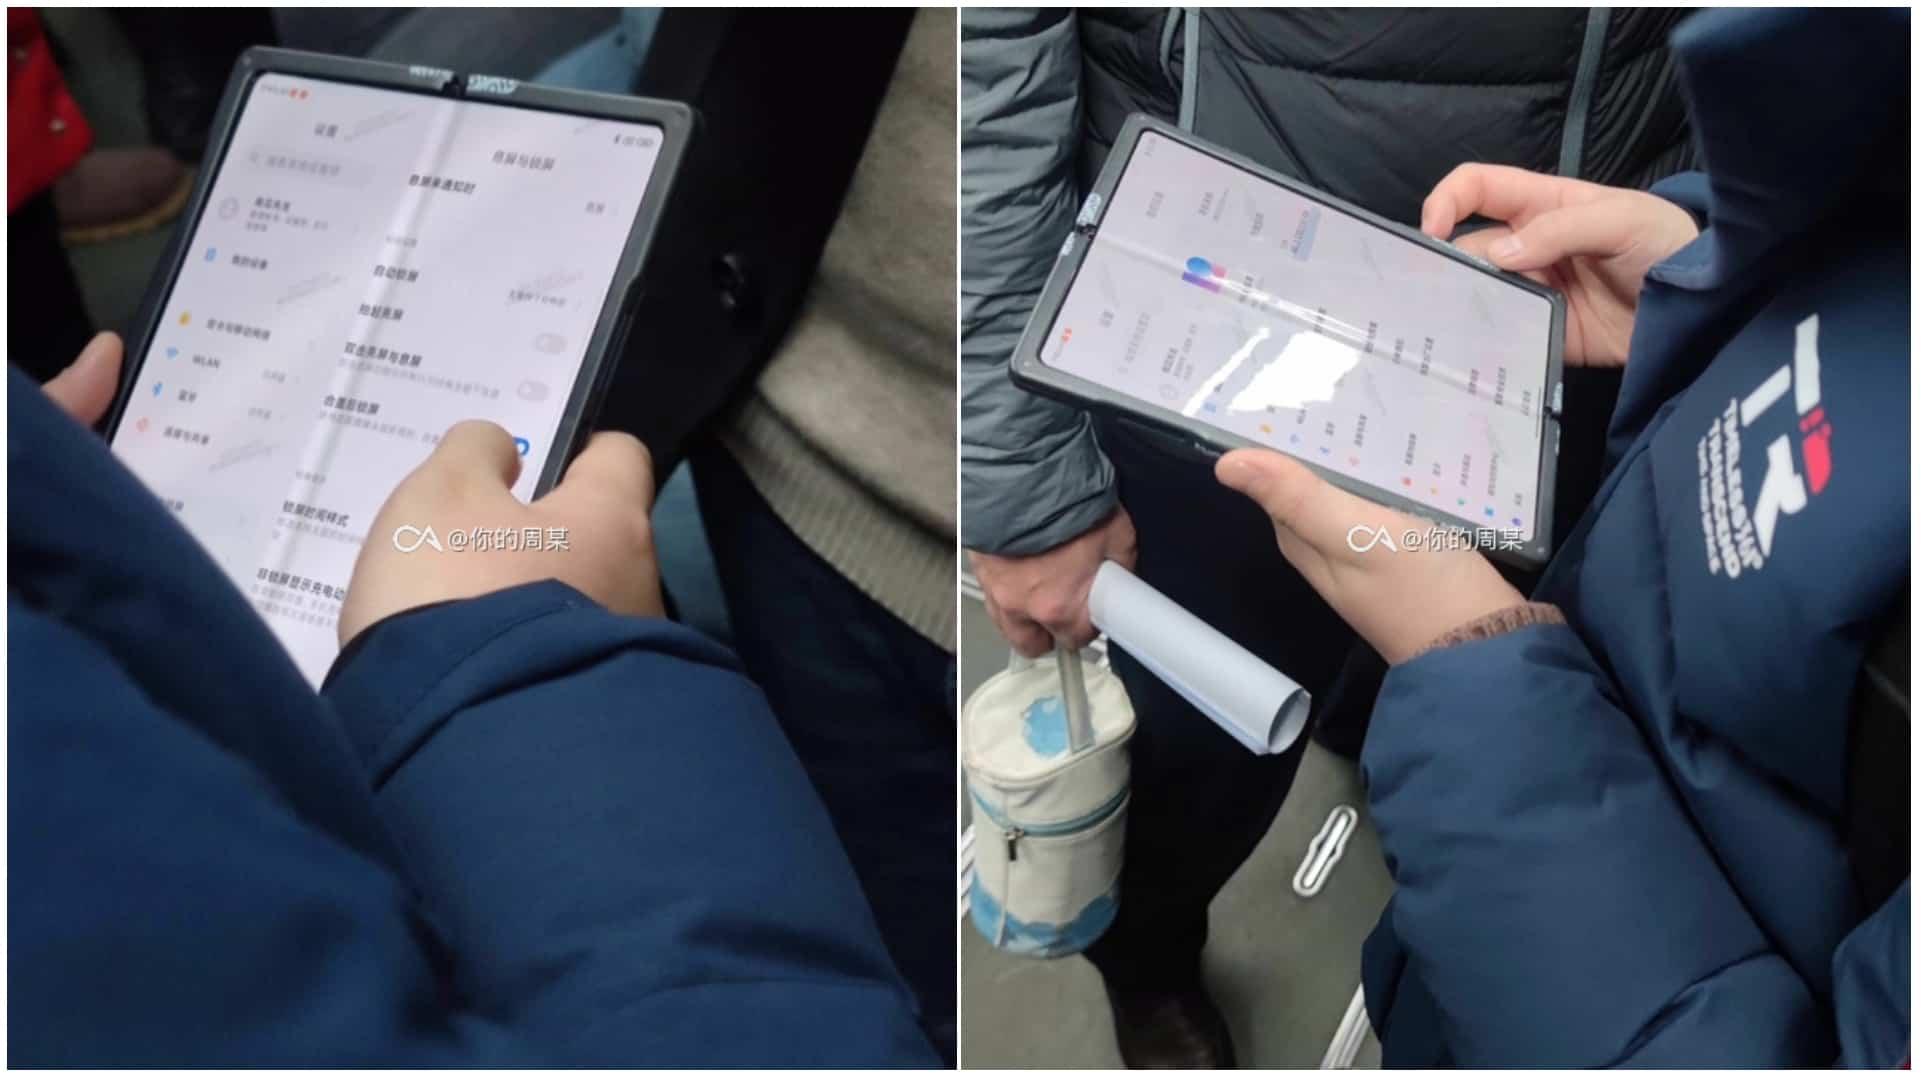 Xiaomi foldable smartphone live image leak featured